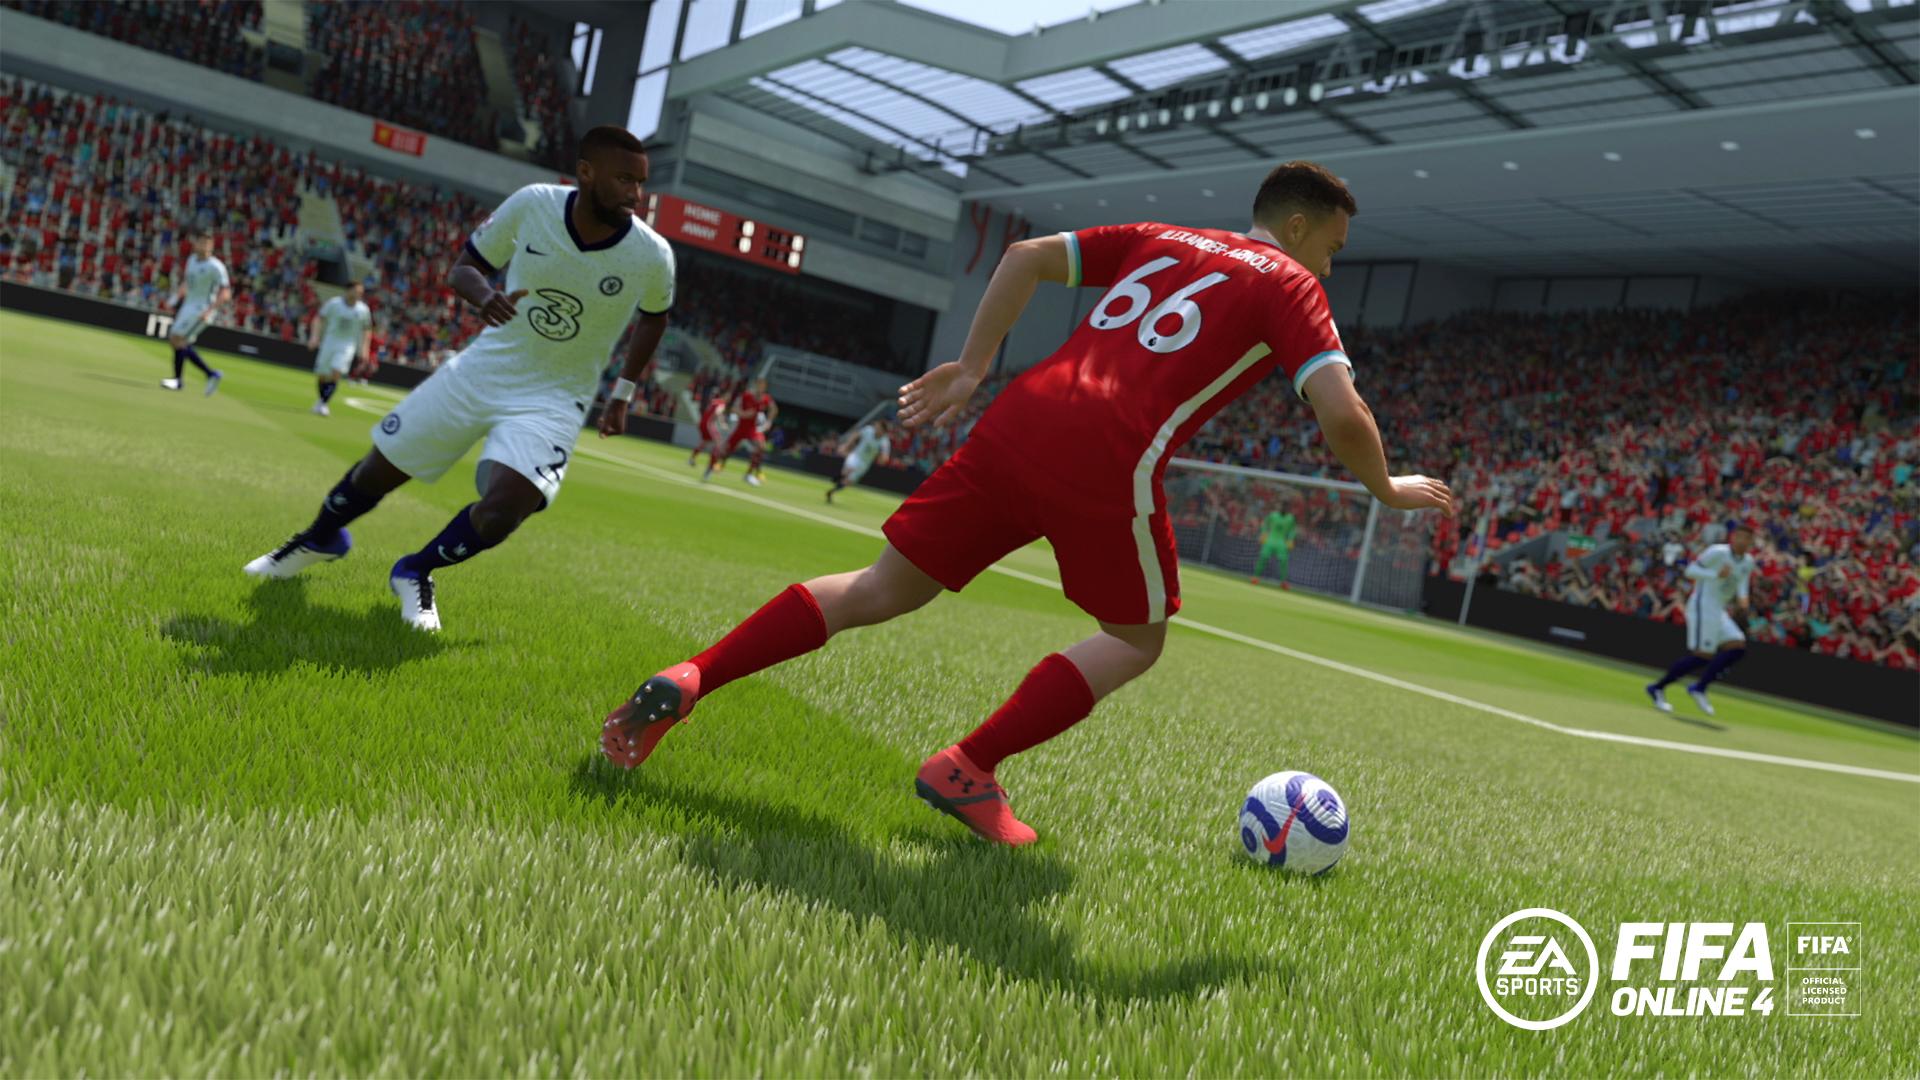 EA SPORTS™ FIFA Online 4 Electronic Arts